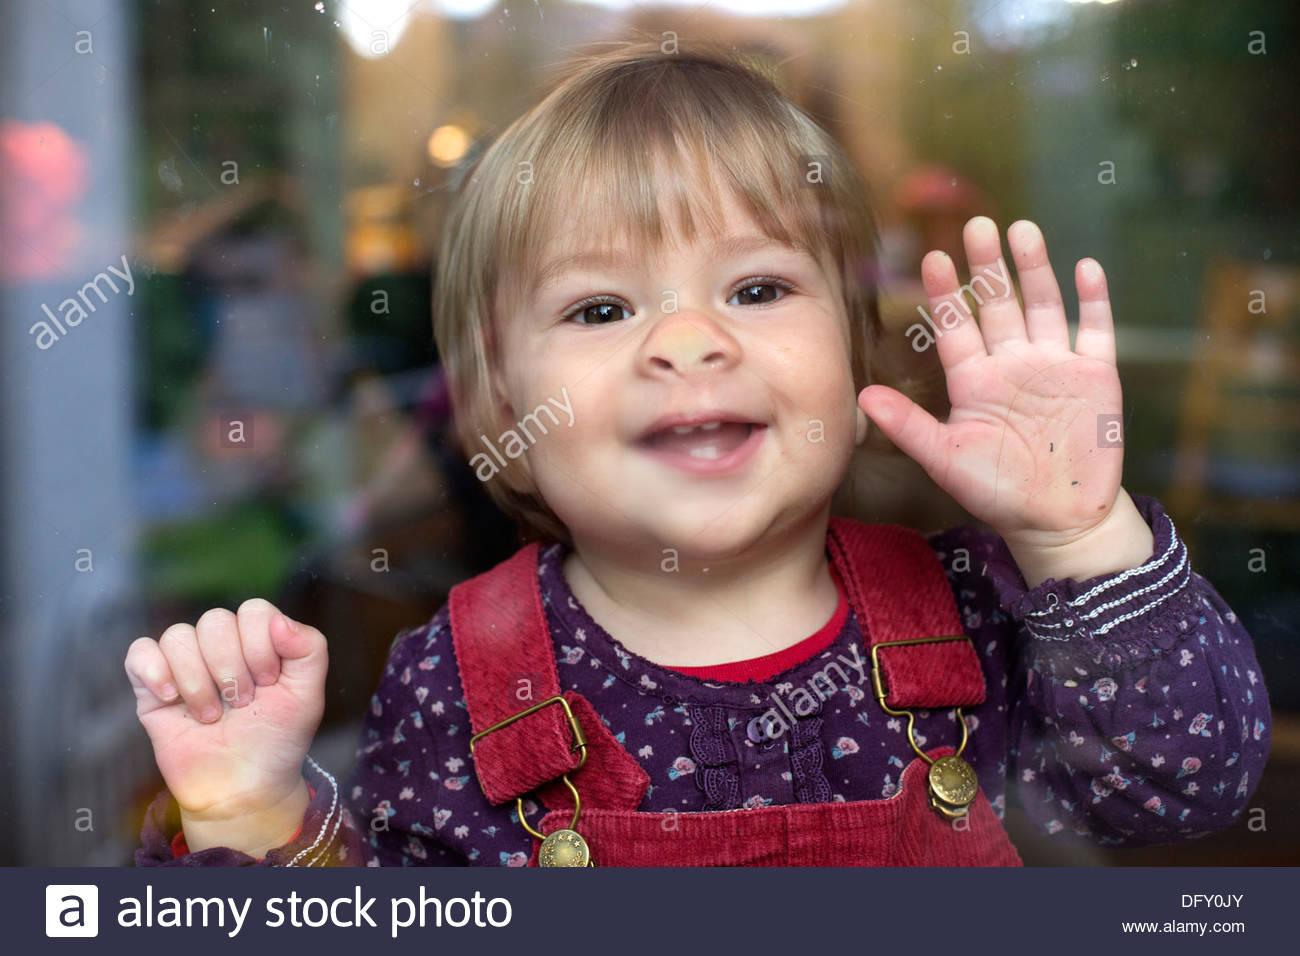 Child behind a window pane - Stock Image